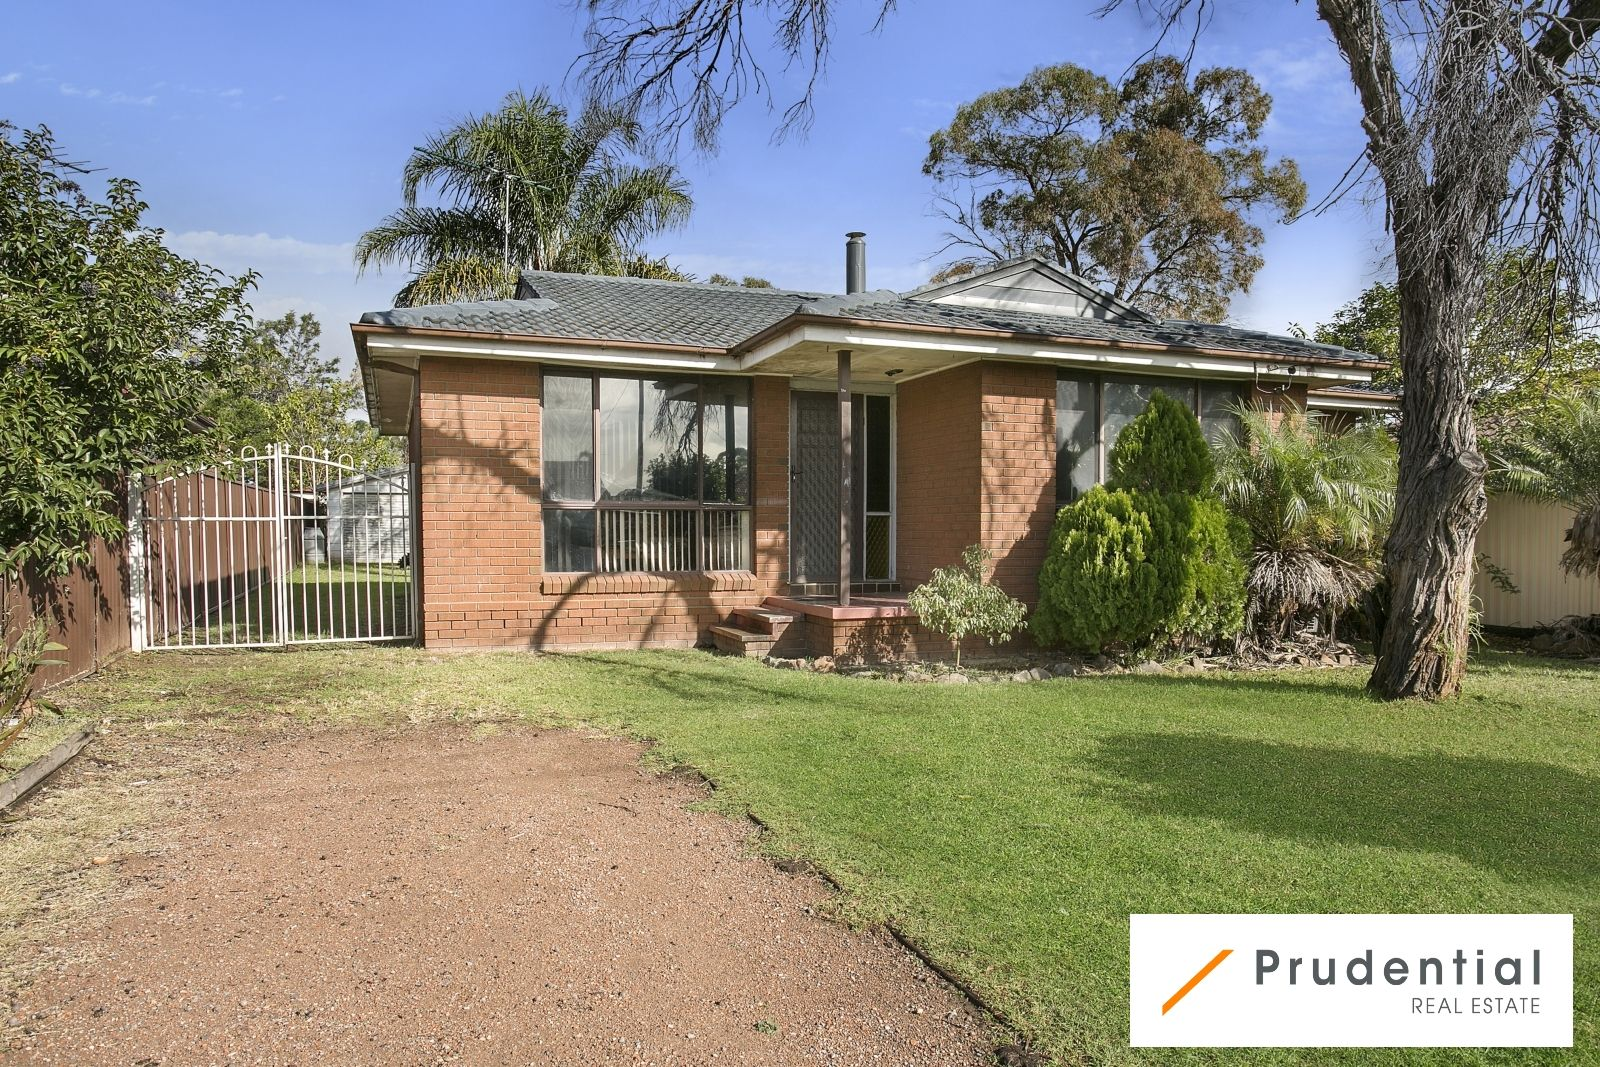 1 Durham Street, Minto NSW 2566, Image 0